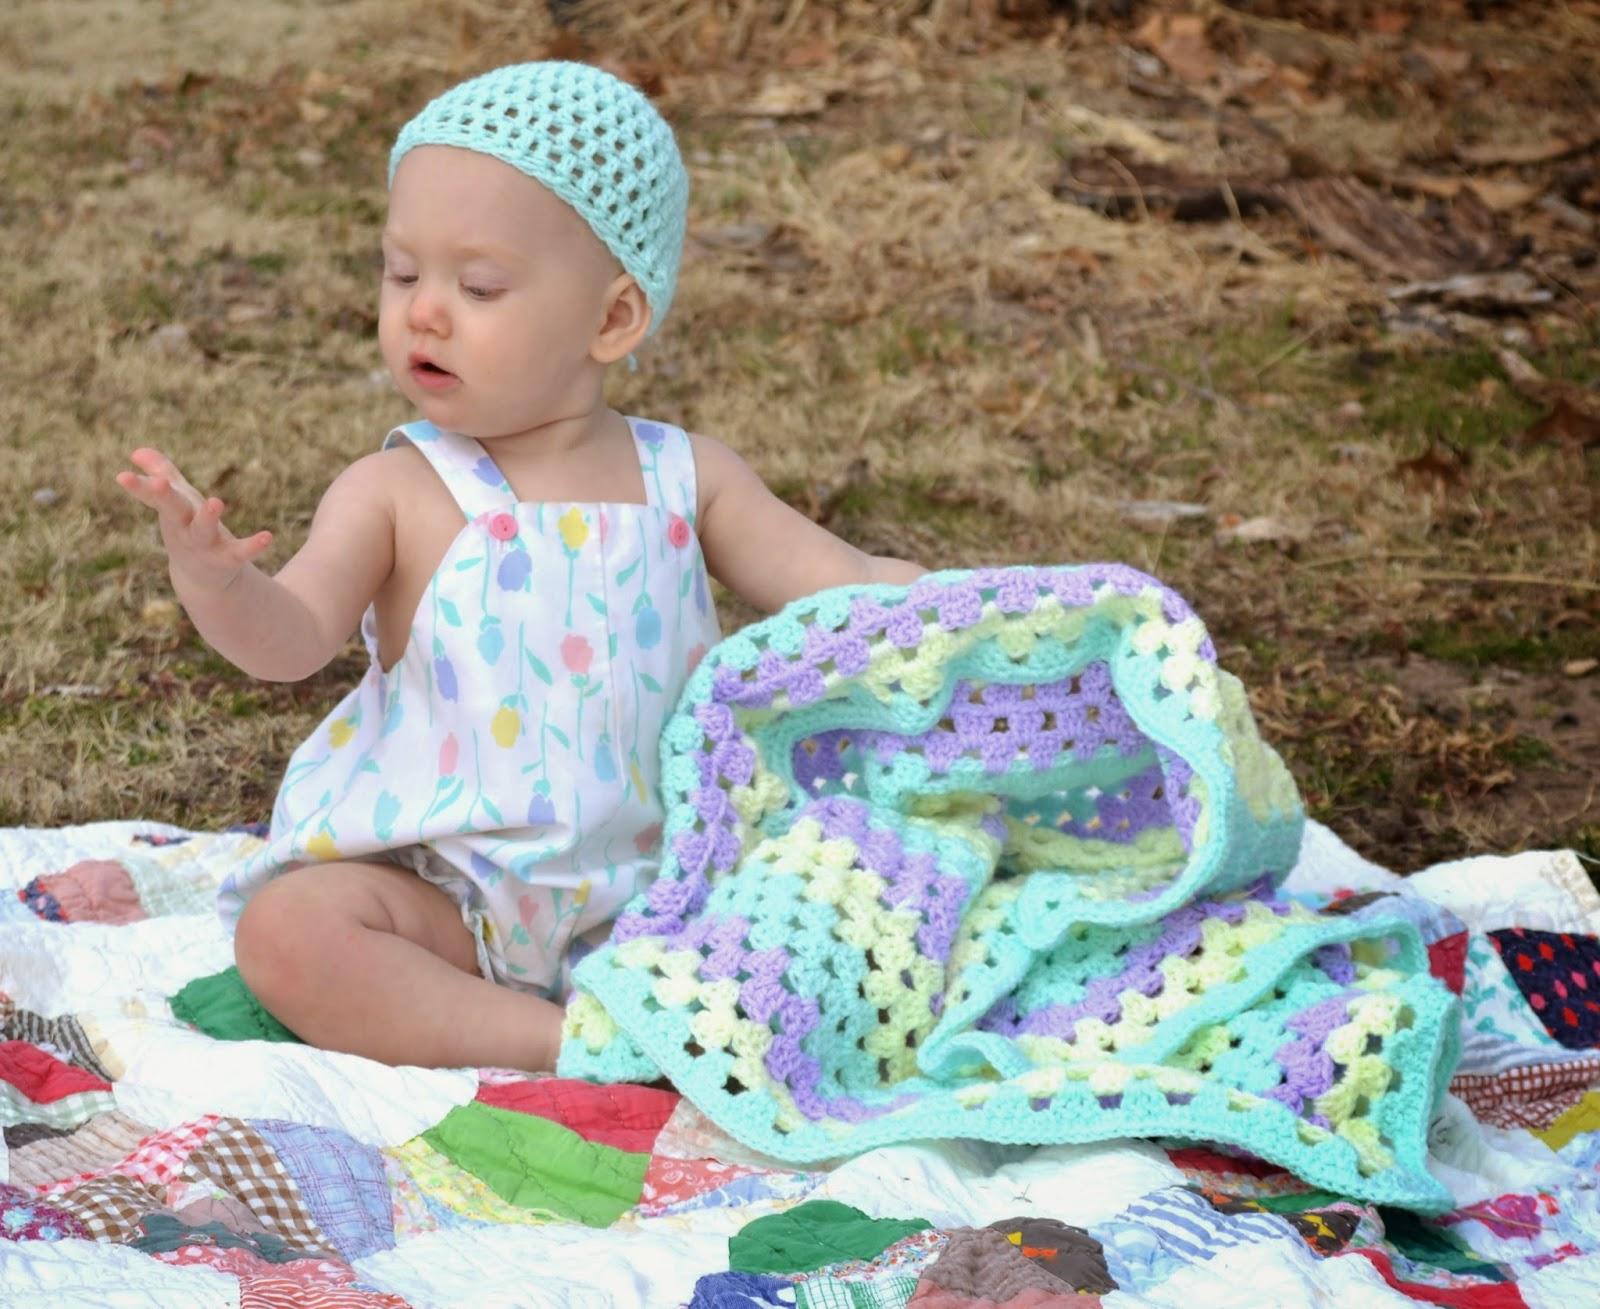 https://www.etsy.com/listing/180697412/alice-blue-hat-and-afghan-set-crochet